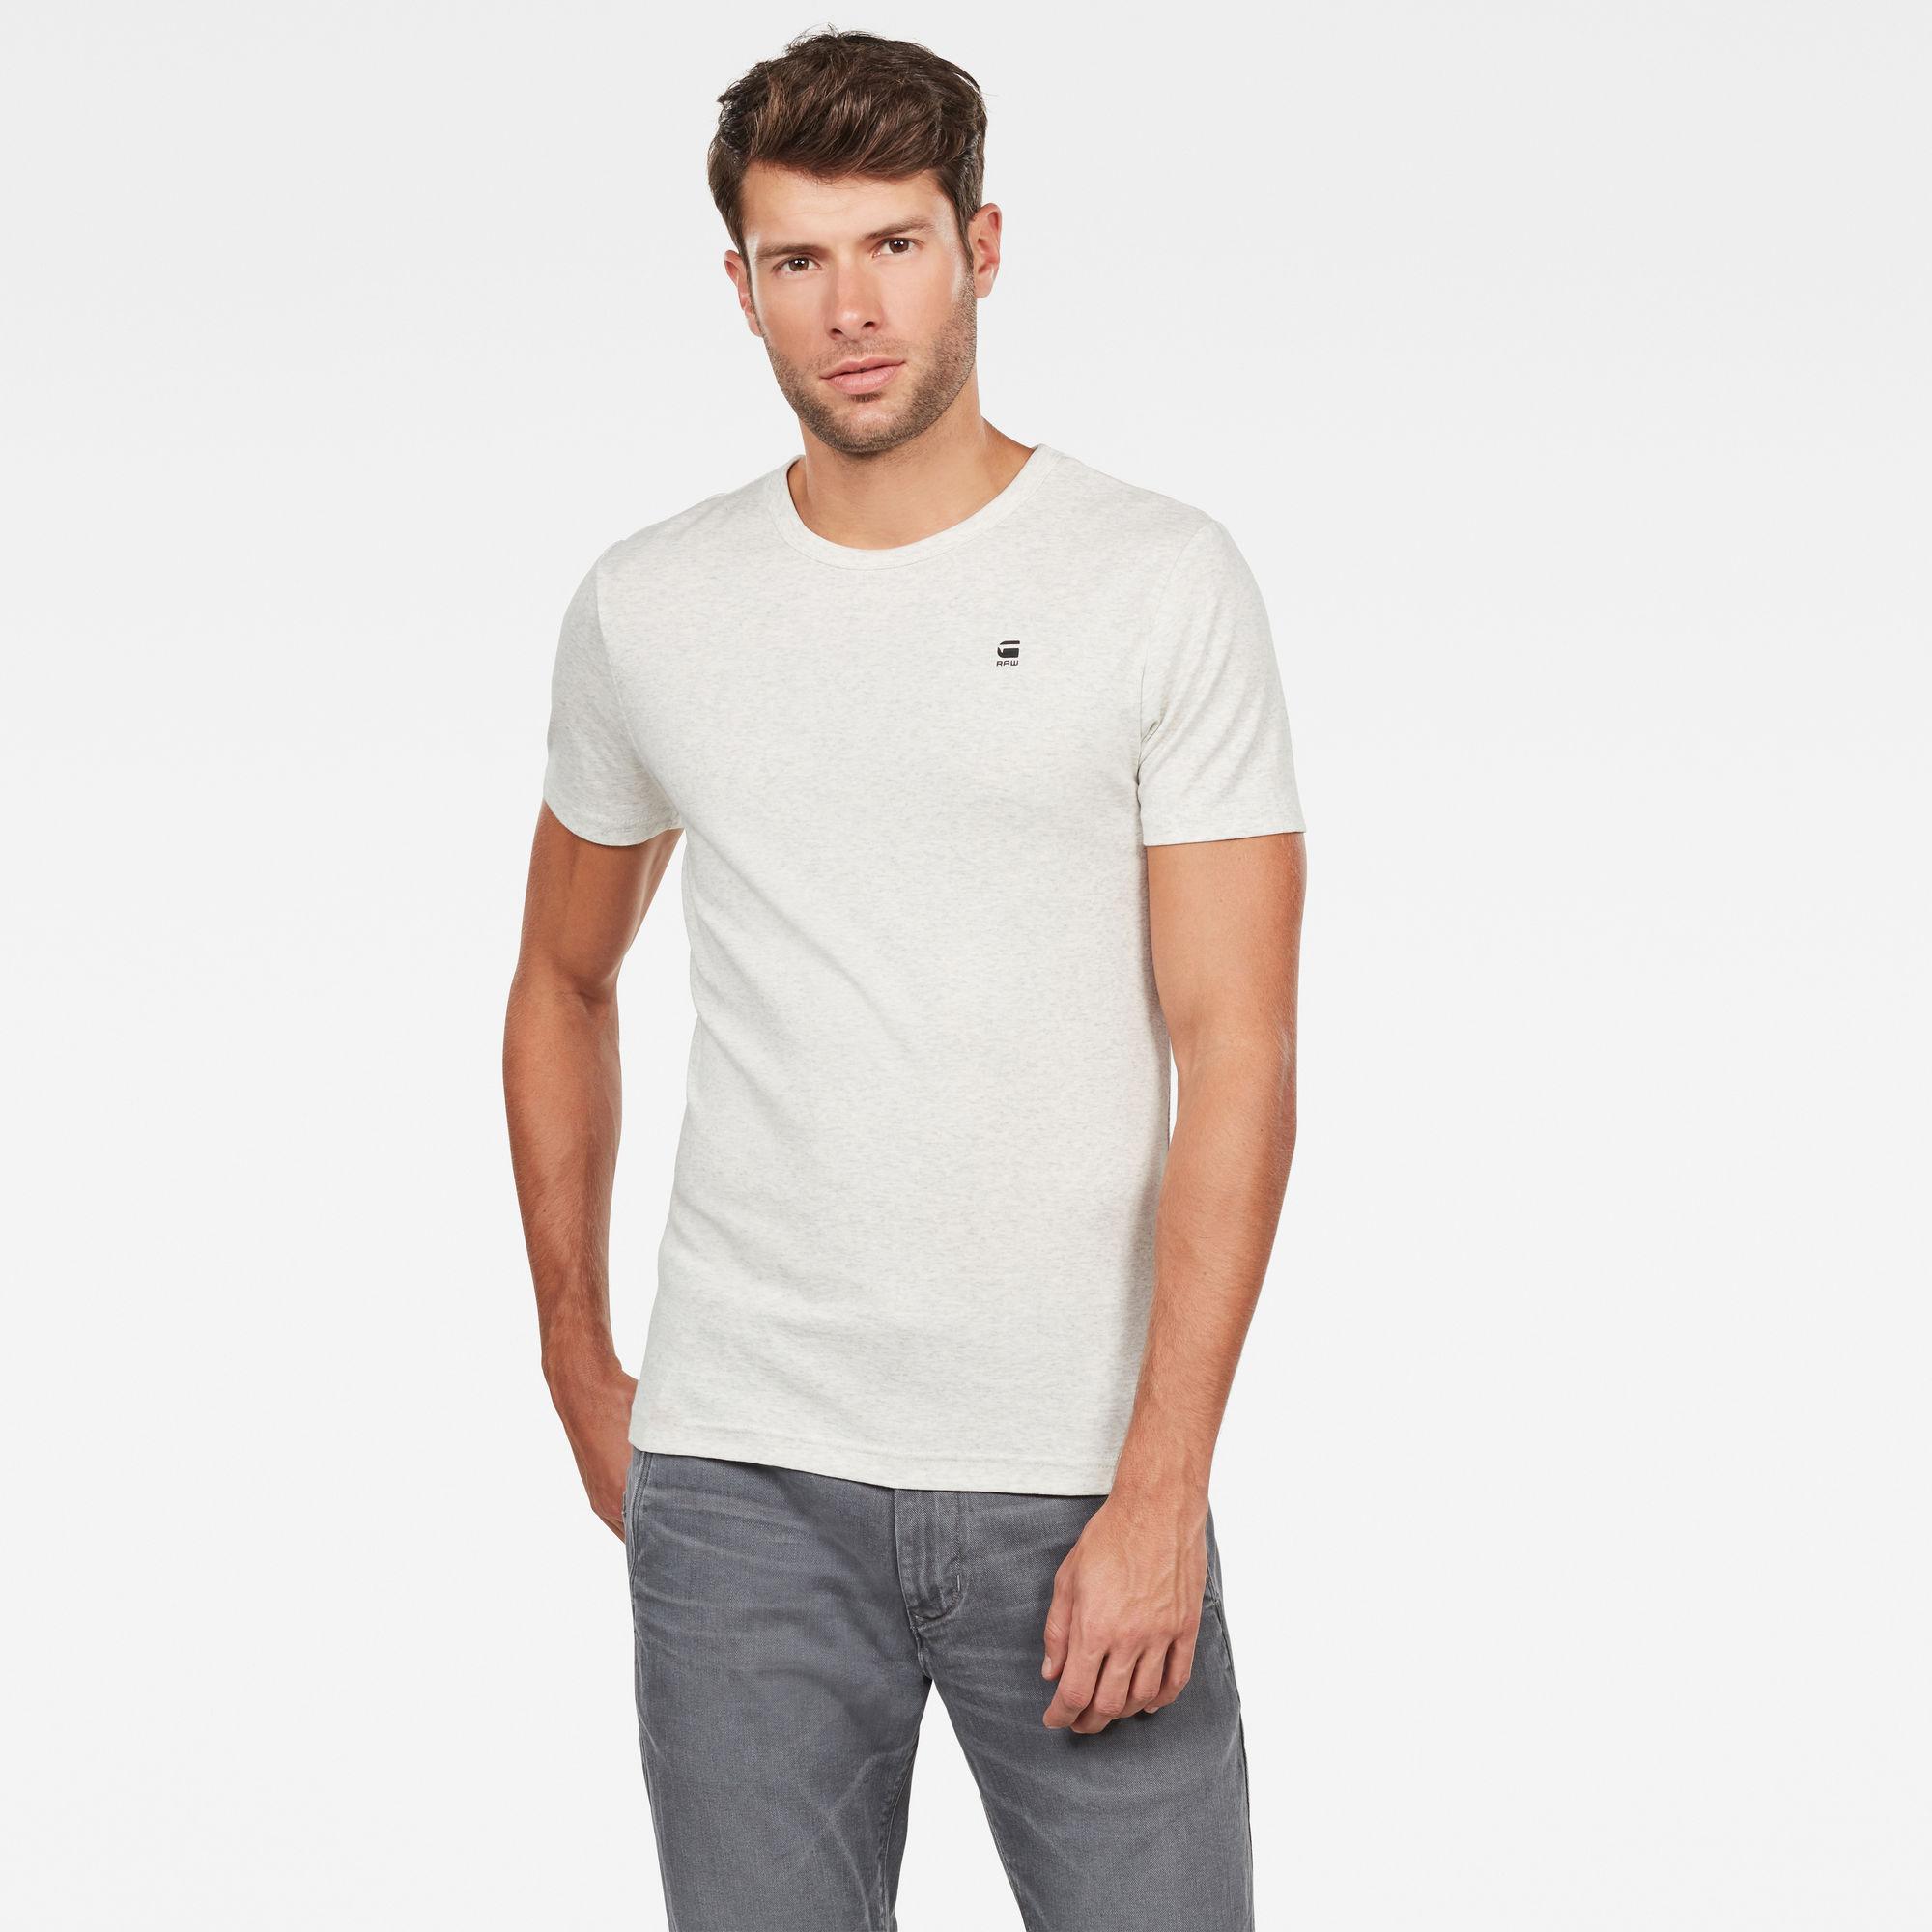 Image of G Star Raw Daplin T-Shirt